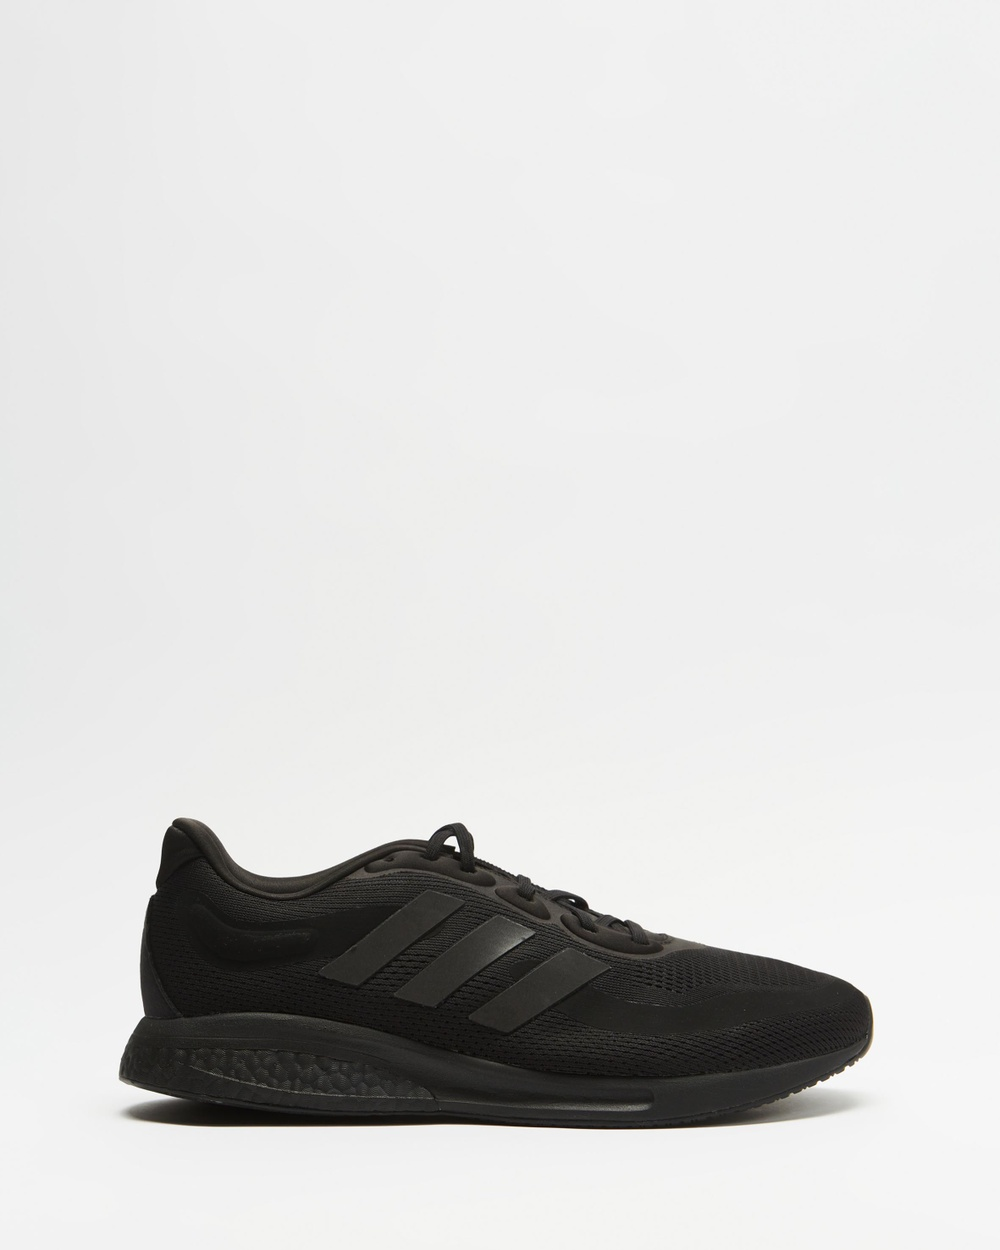 adidas Performance Supernova Shoes Men's Core Black, Core Black & Halo Silver